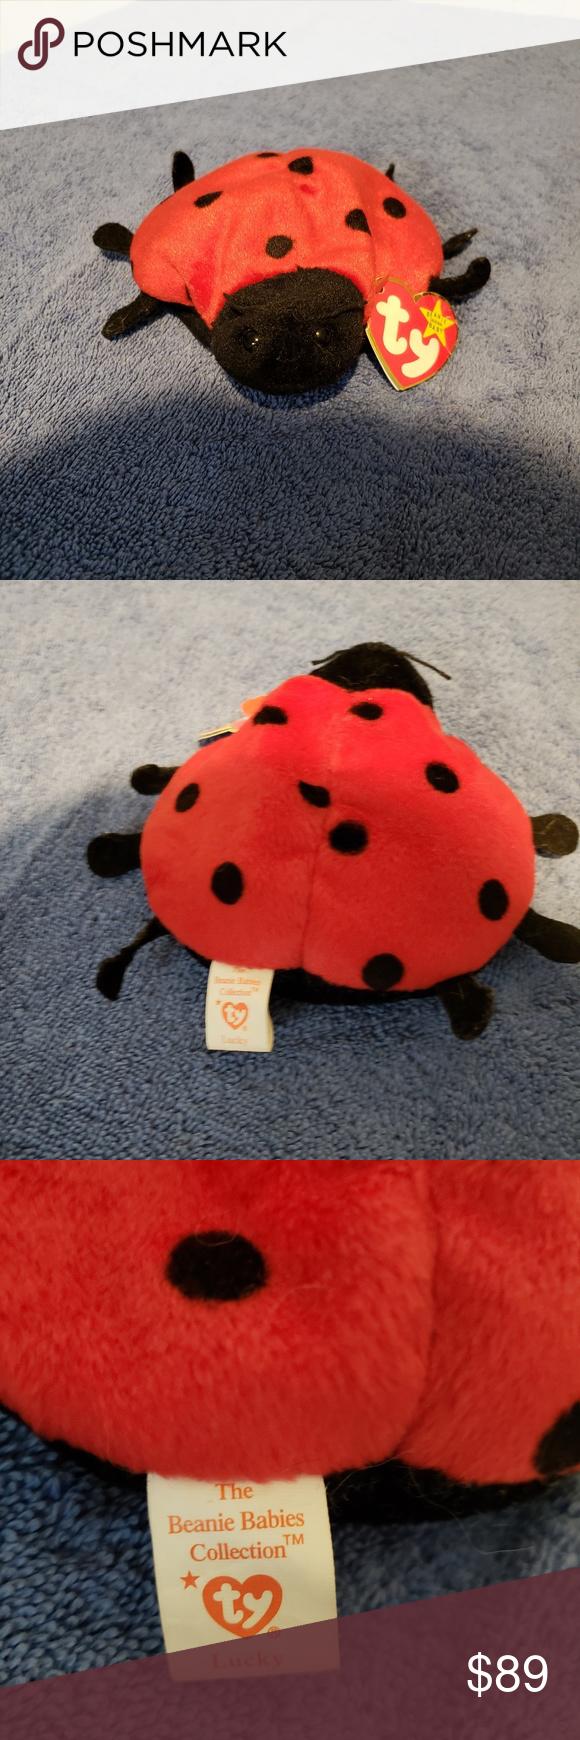 Ty Beanie Babies Lucky 1995 Ladybug Style 4040 12 Ty